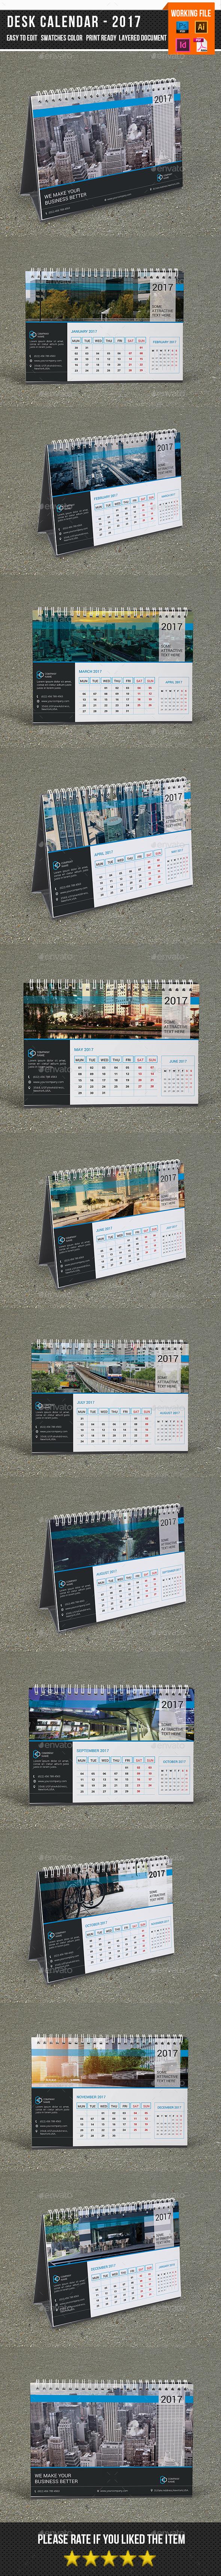 Desk Calendar for 2017 | Updated-V15 - Calendars Stationery